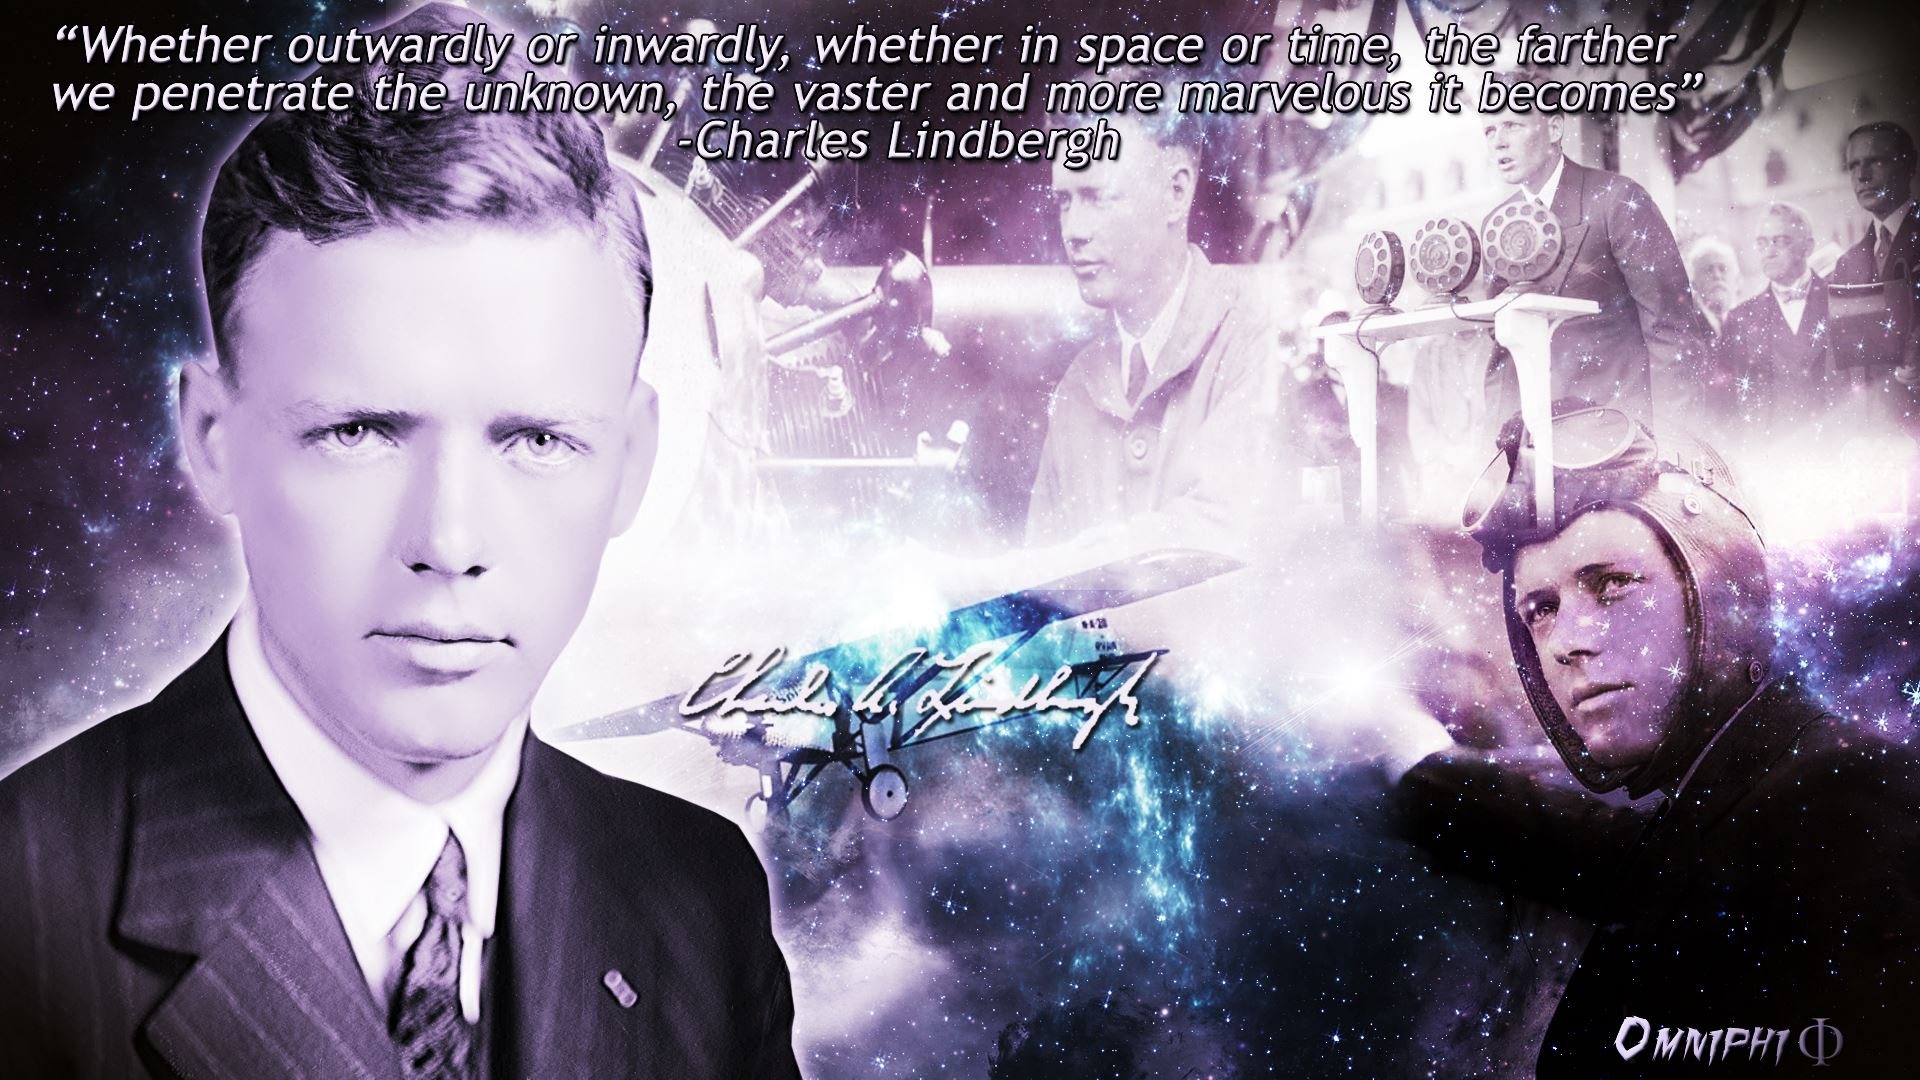 http://www.the-savoisien.com/blog/public/img27/Charles_Lindbergh.jpg